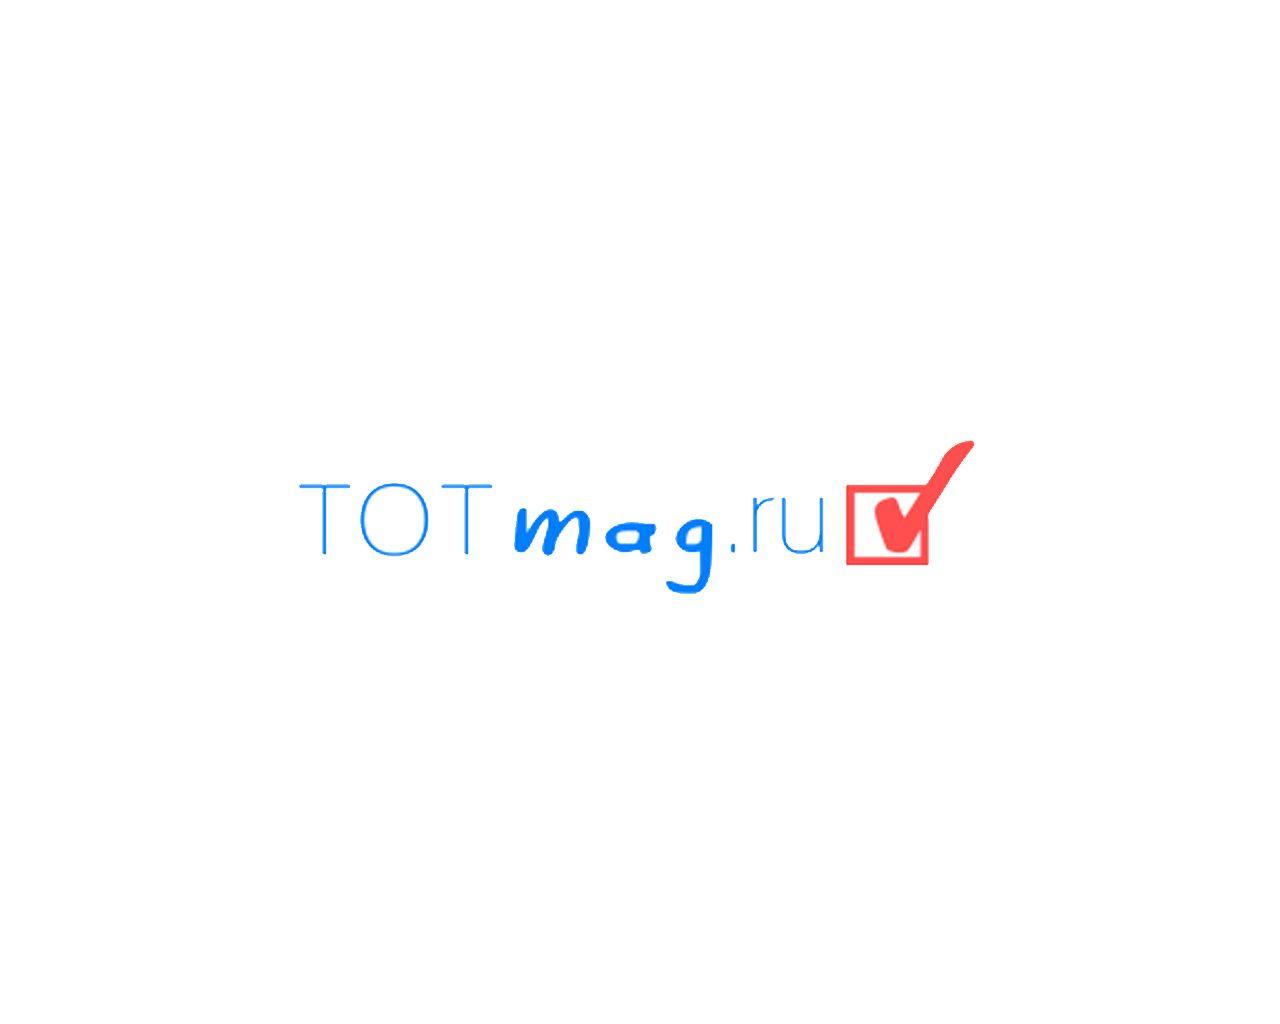 Логотип для интернет магазина totmag.ru - дизайнер BeSSpaloFF